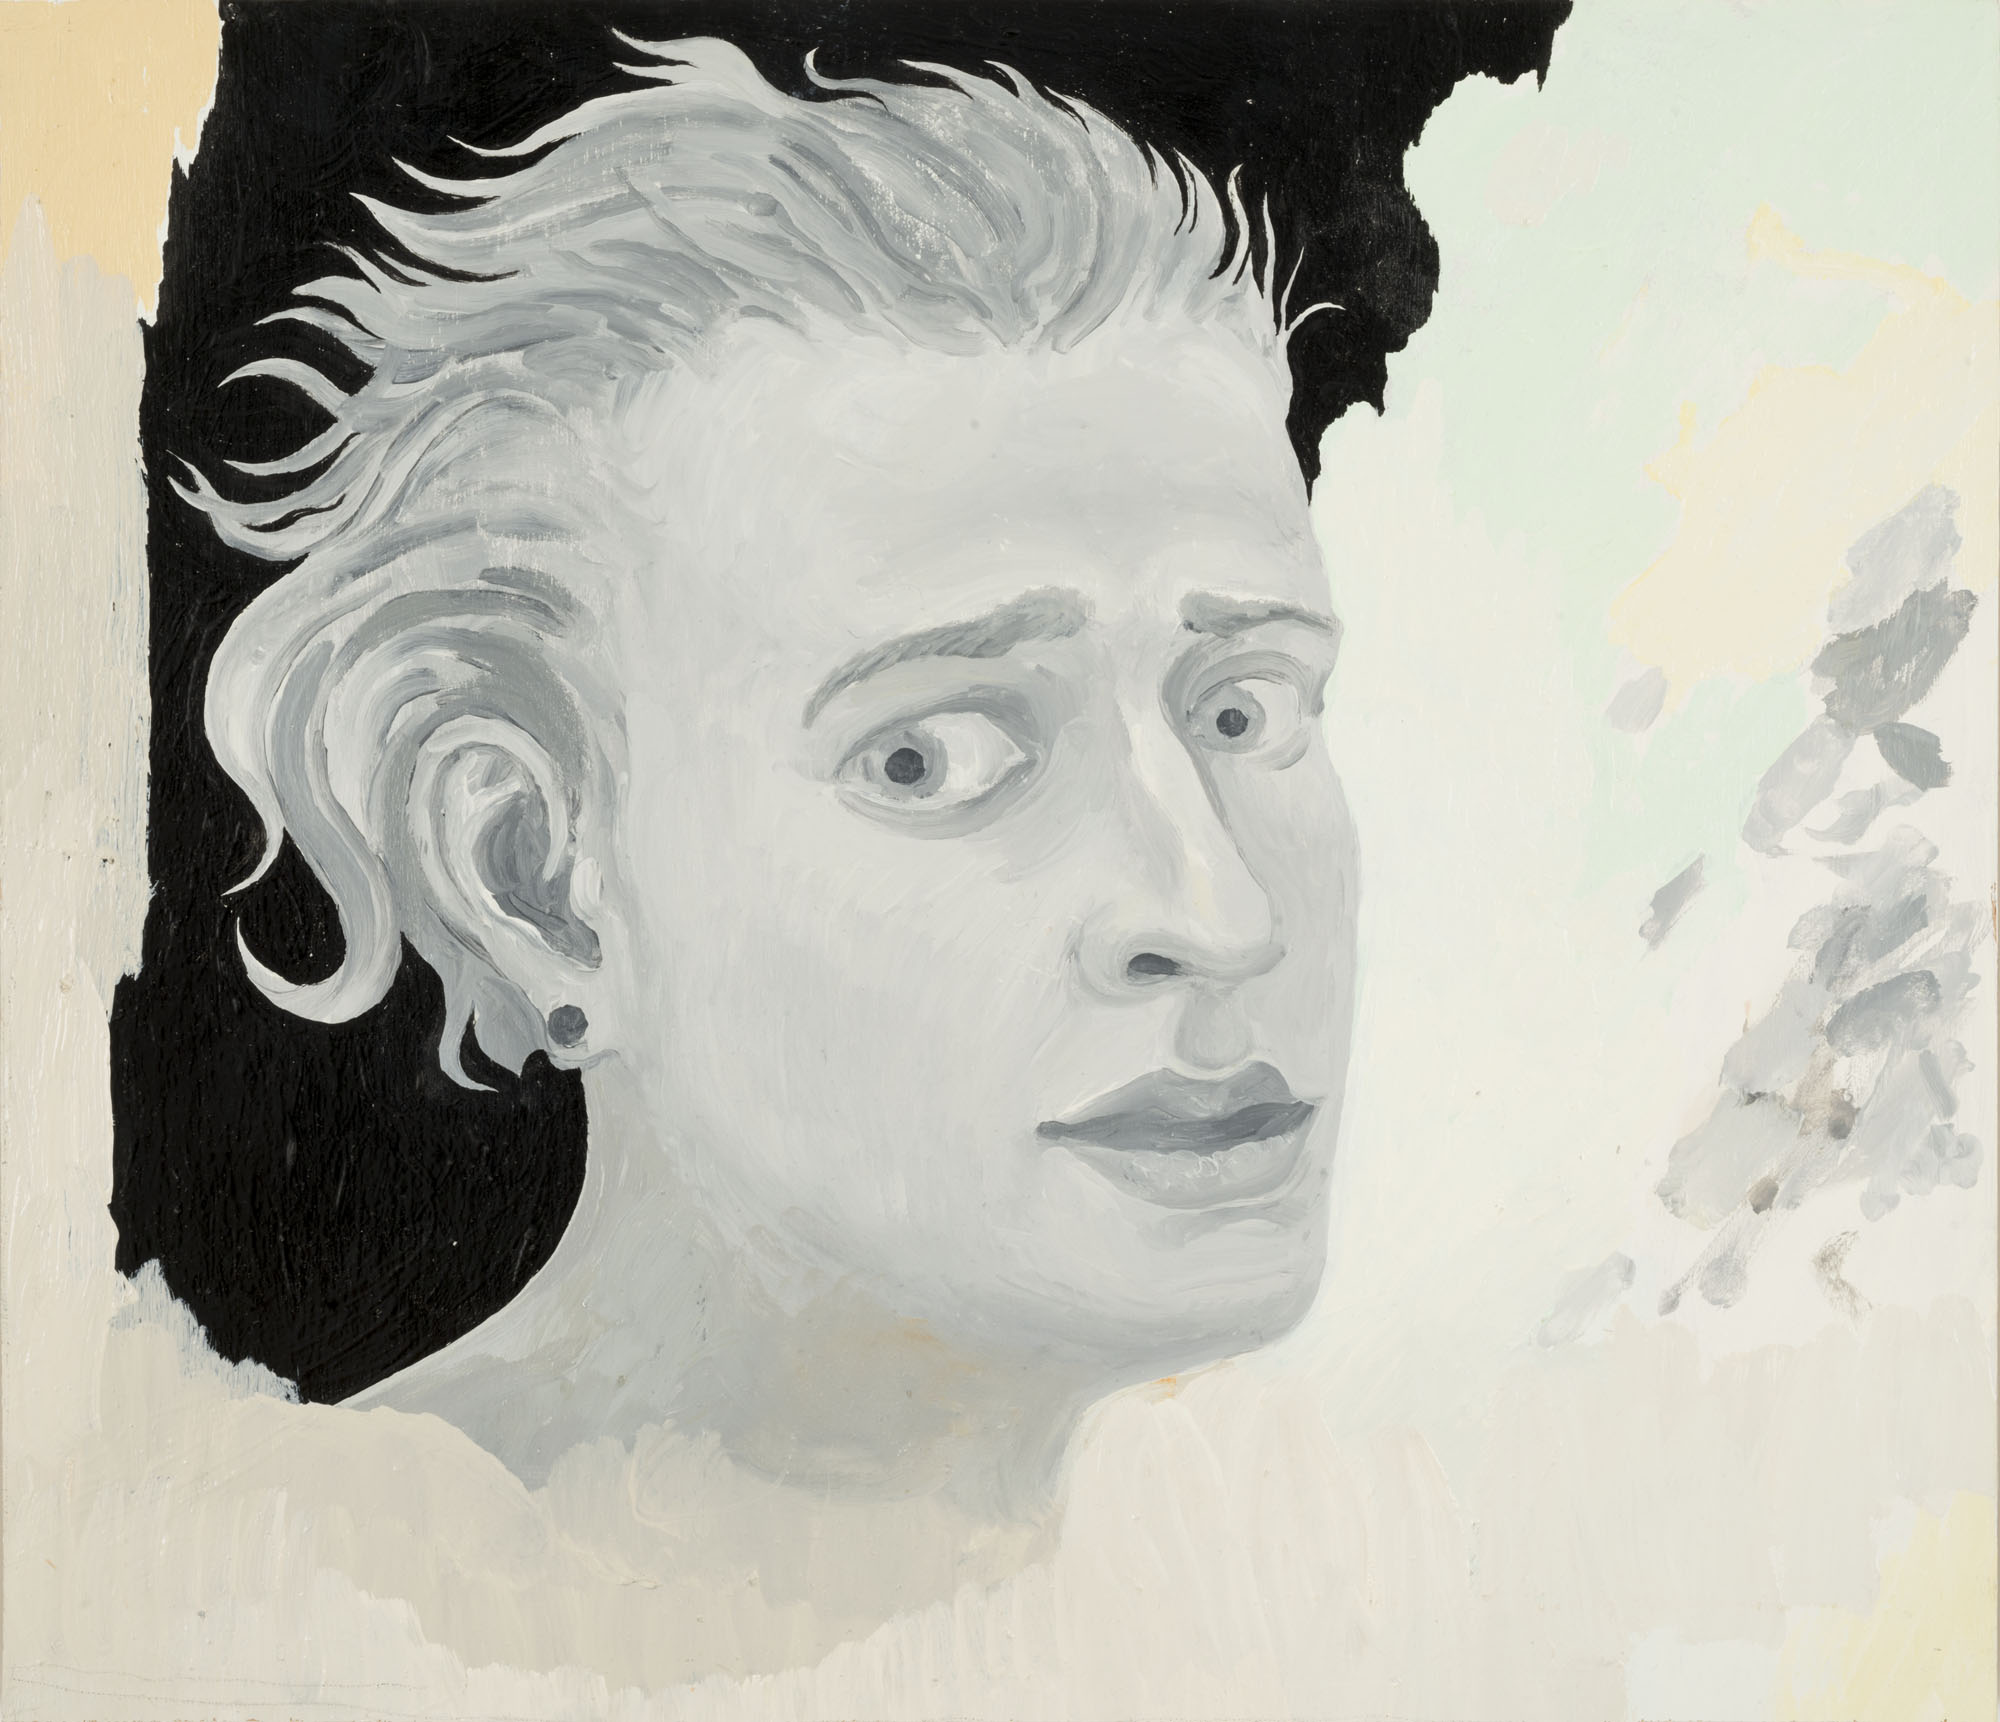 Mi Kafchin   Scared Self Portrait , 2017  Oil on wood  38 x 44 cm  15 x 17.5 inches